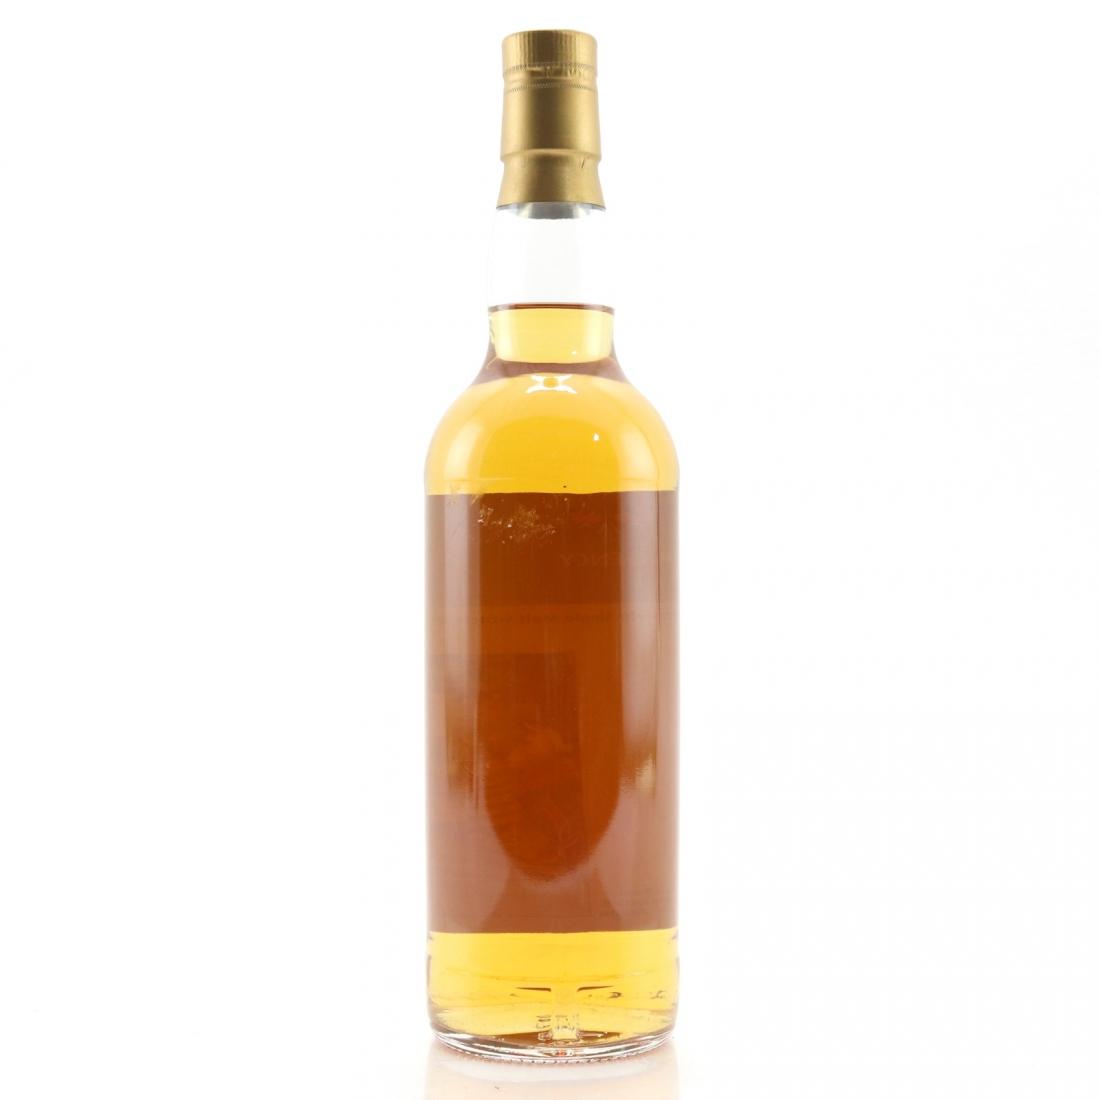 Glenburgie 1992 Whisky Agency 21 Year Old